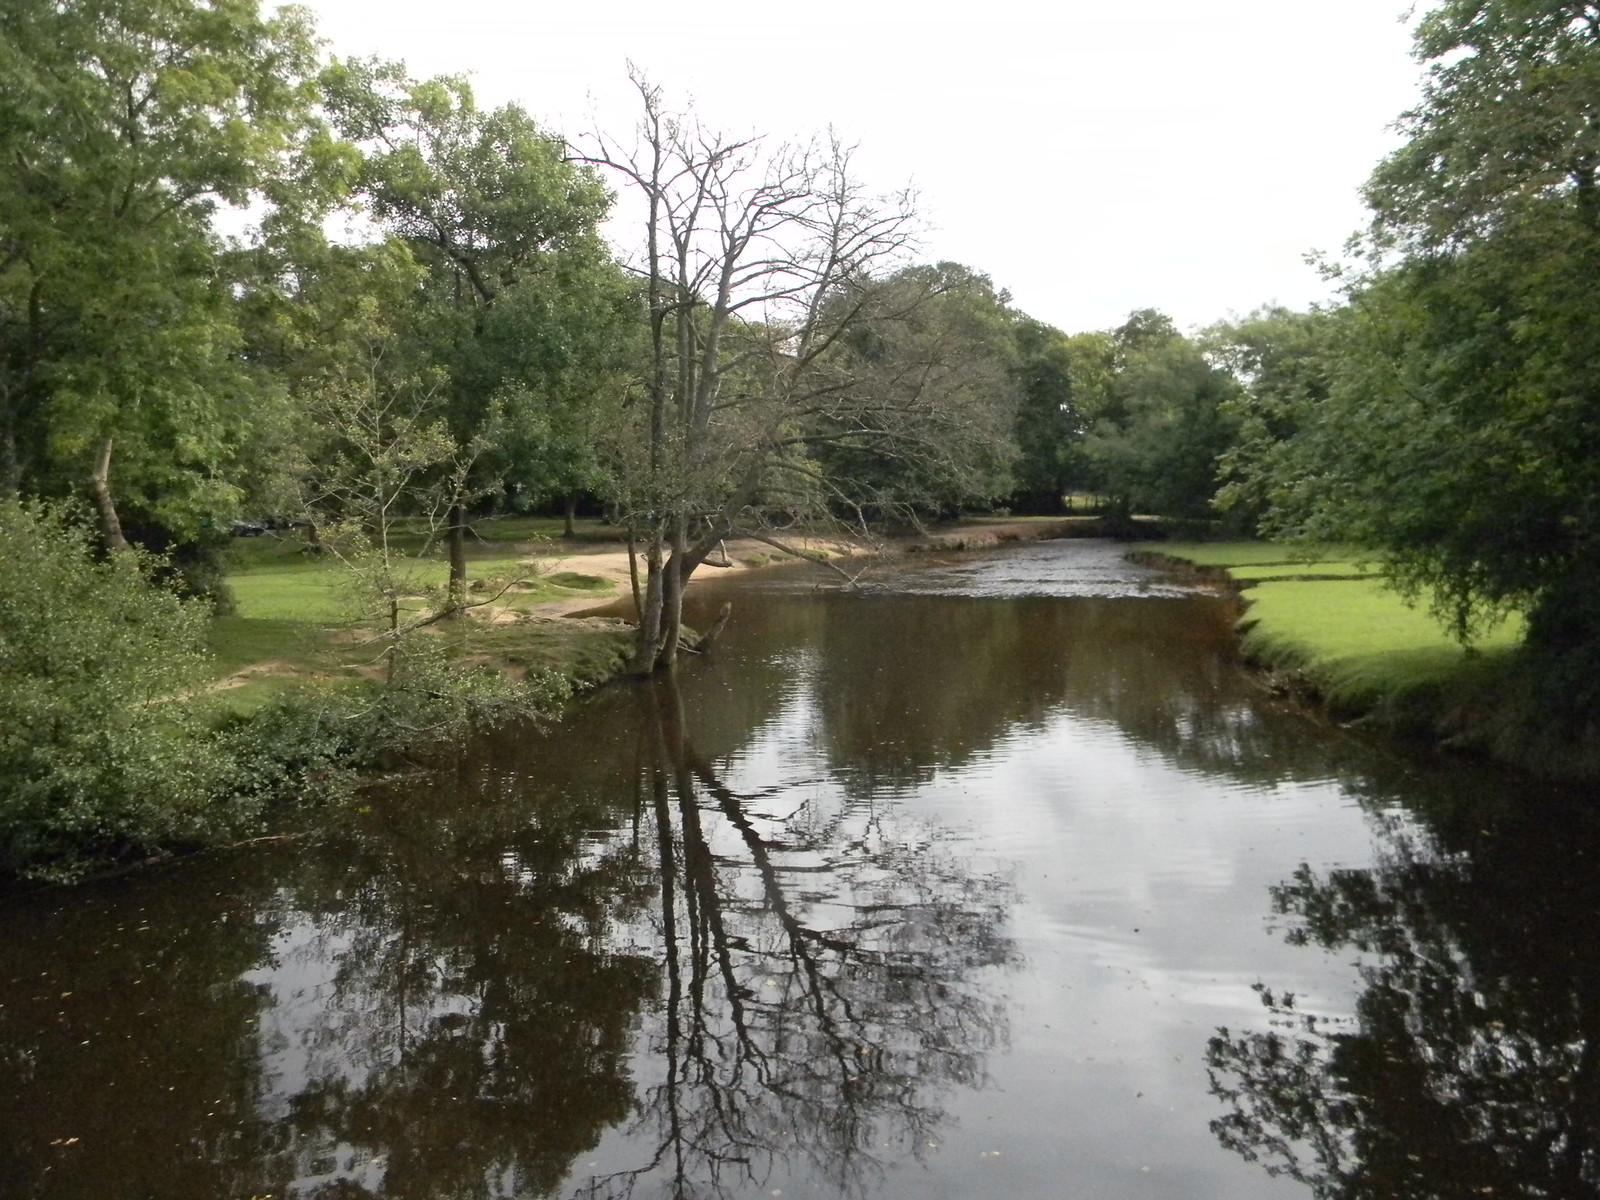 Watercourse Brockenhurst Circular